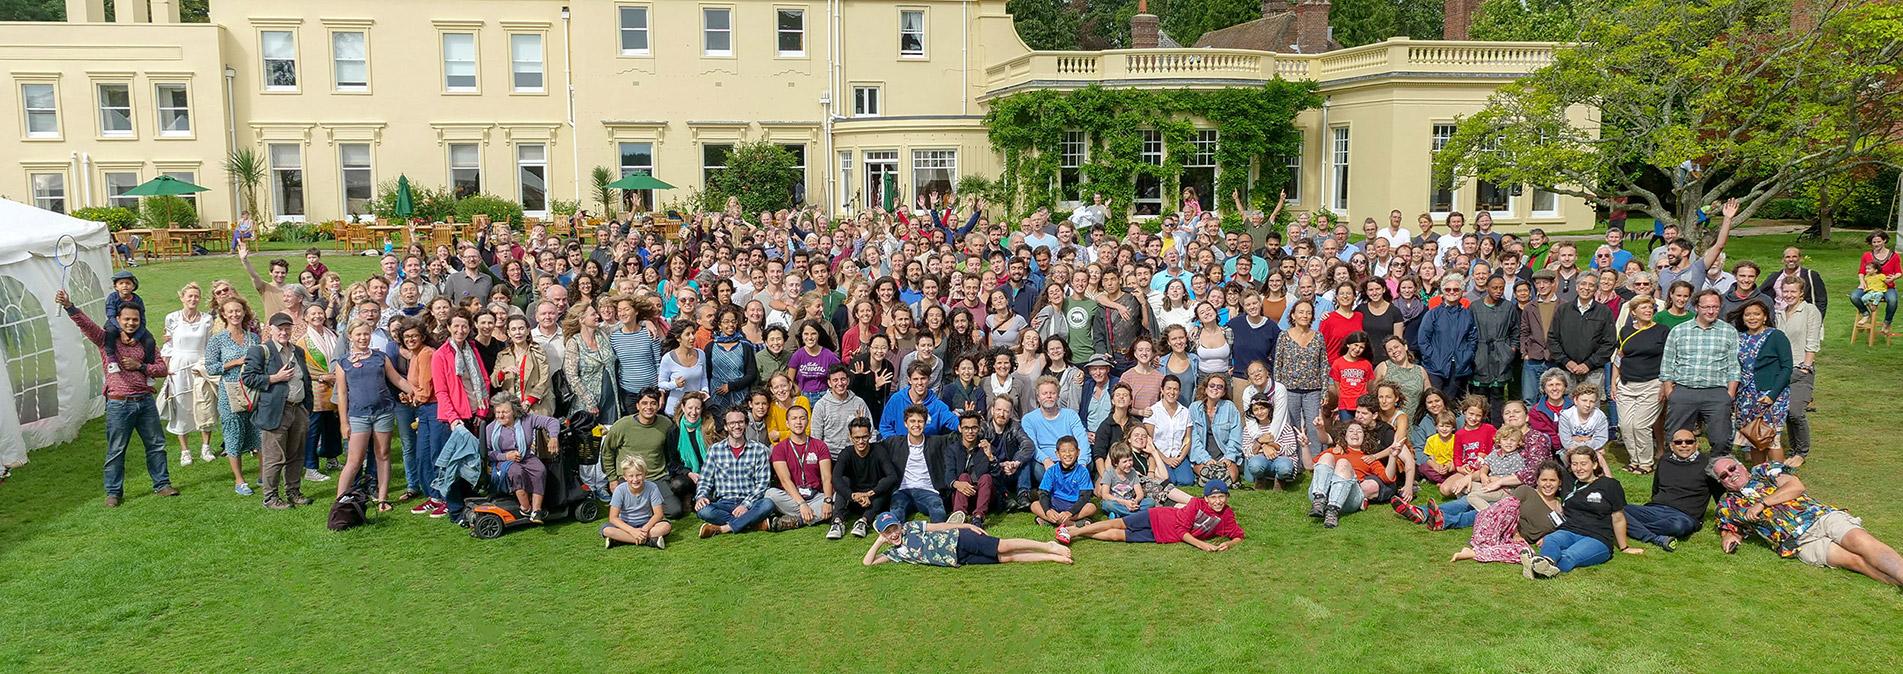 Group photo of hundreds of alumni gathering at Brockwood Park School